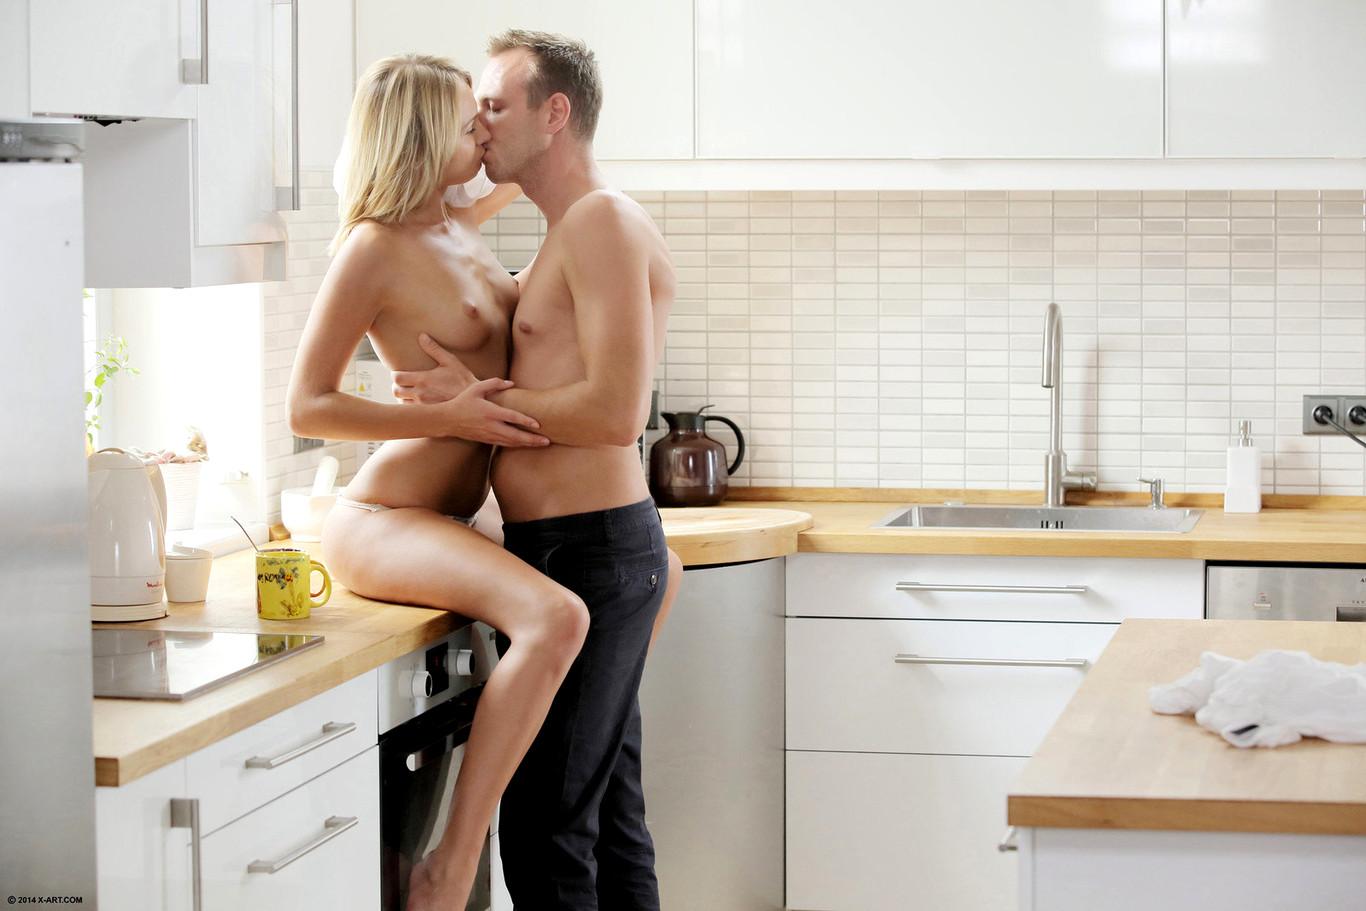 младенцам, весело на кухне порно наслаждаются